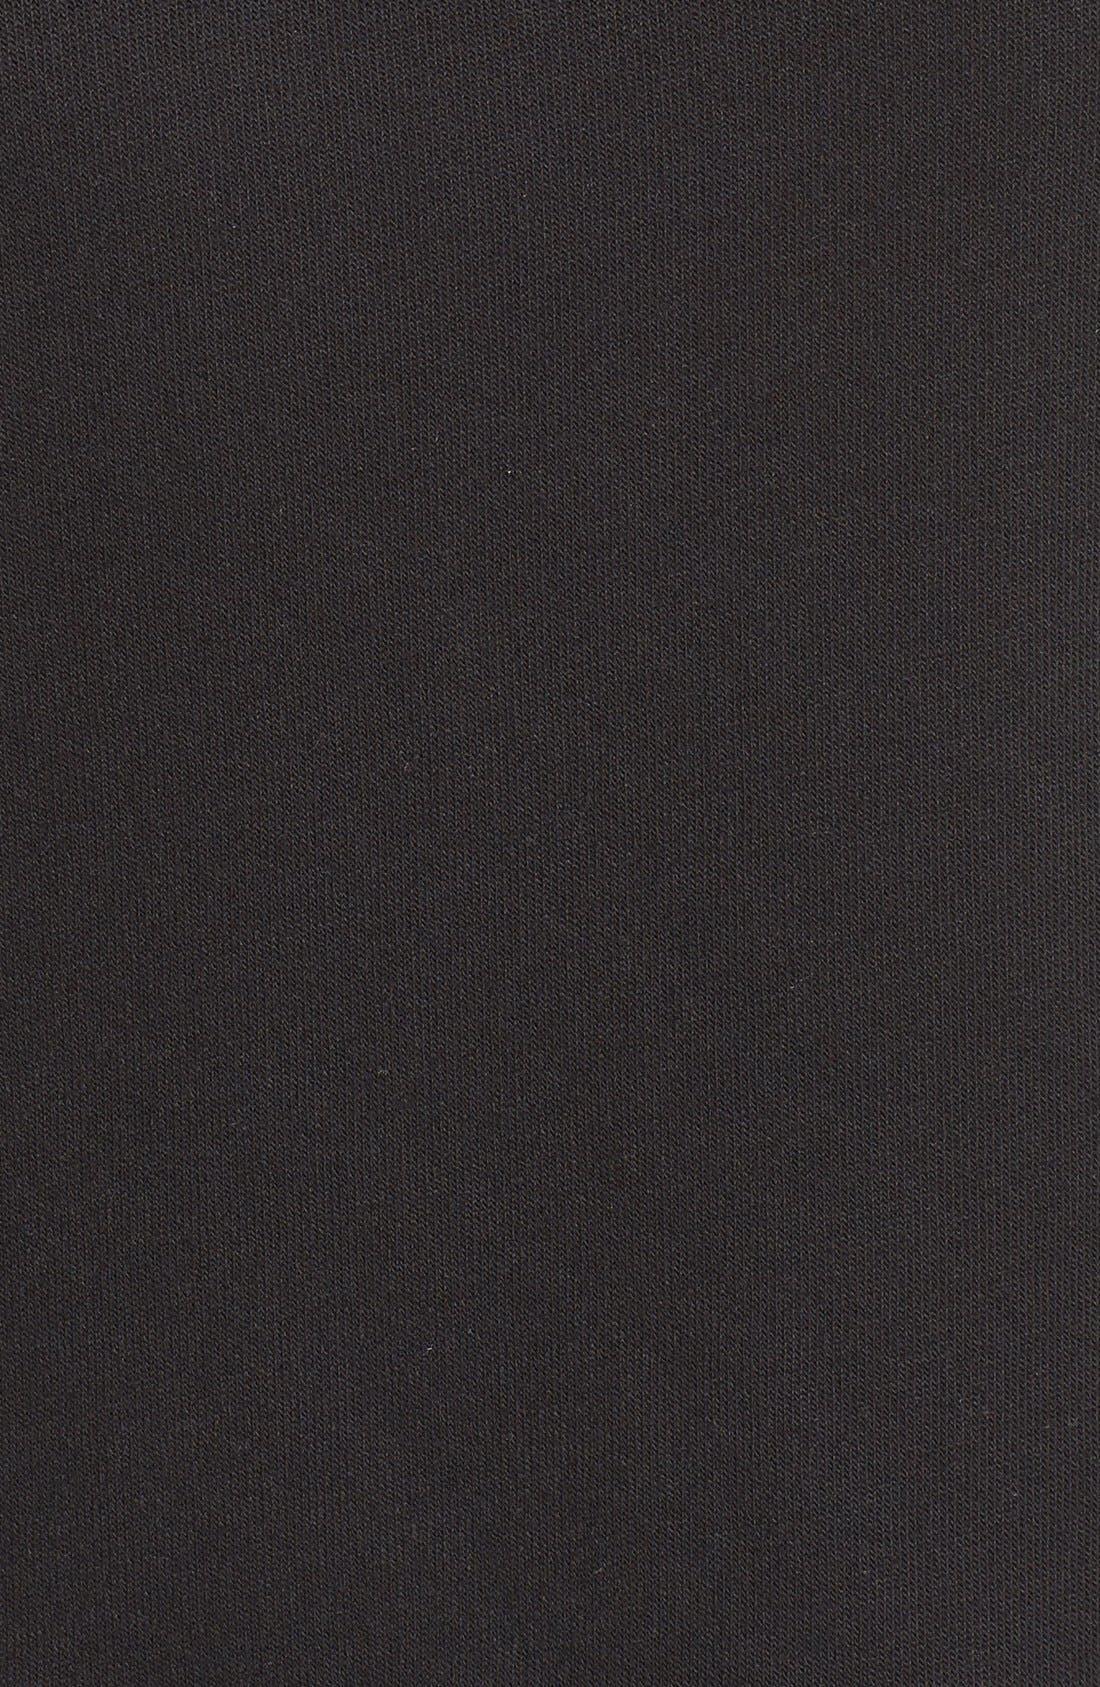 'Haze' Funnel Neck Sweatshirt,                             Alternate thumbnail 3, color,                             BLACK